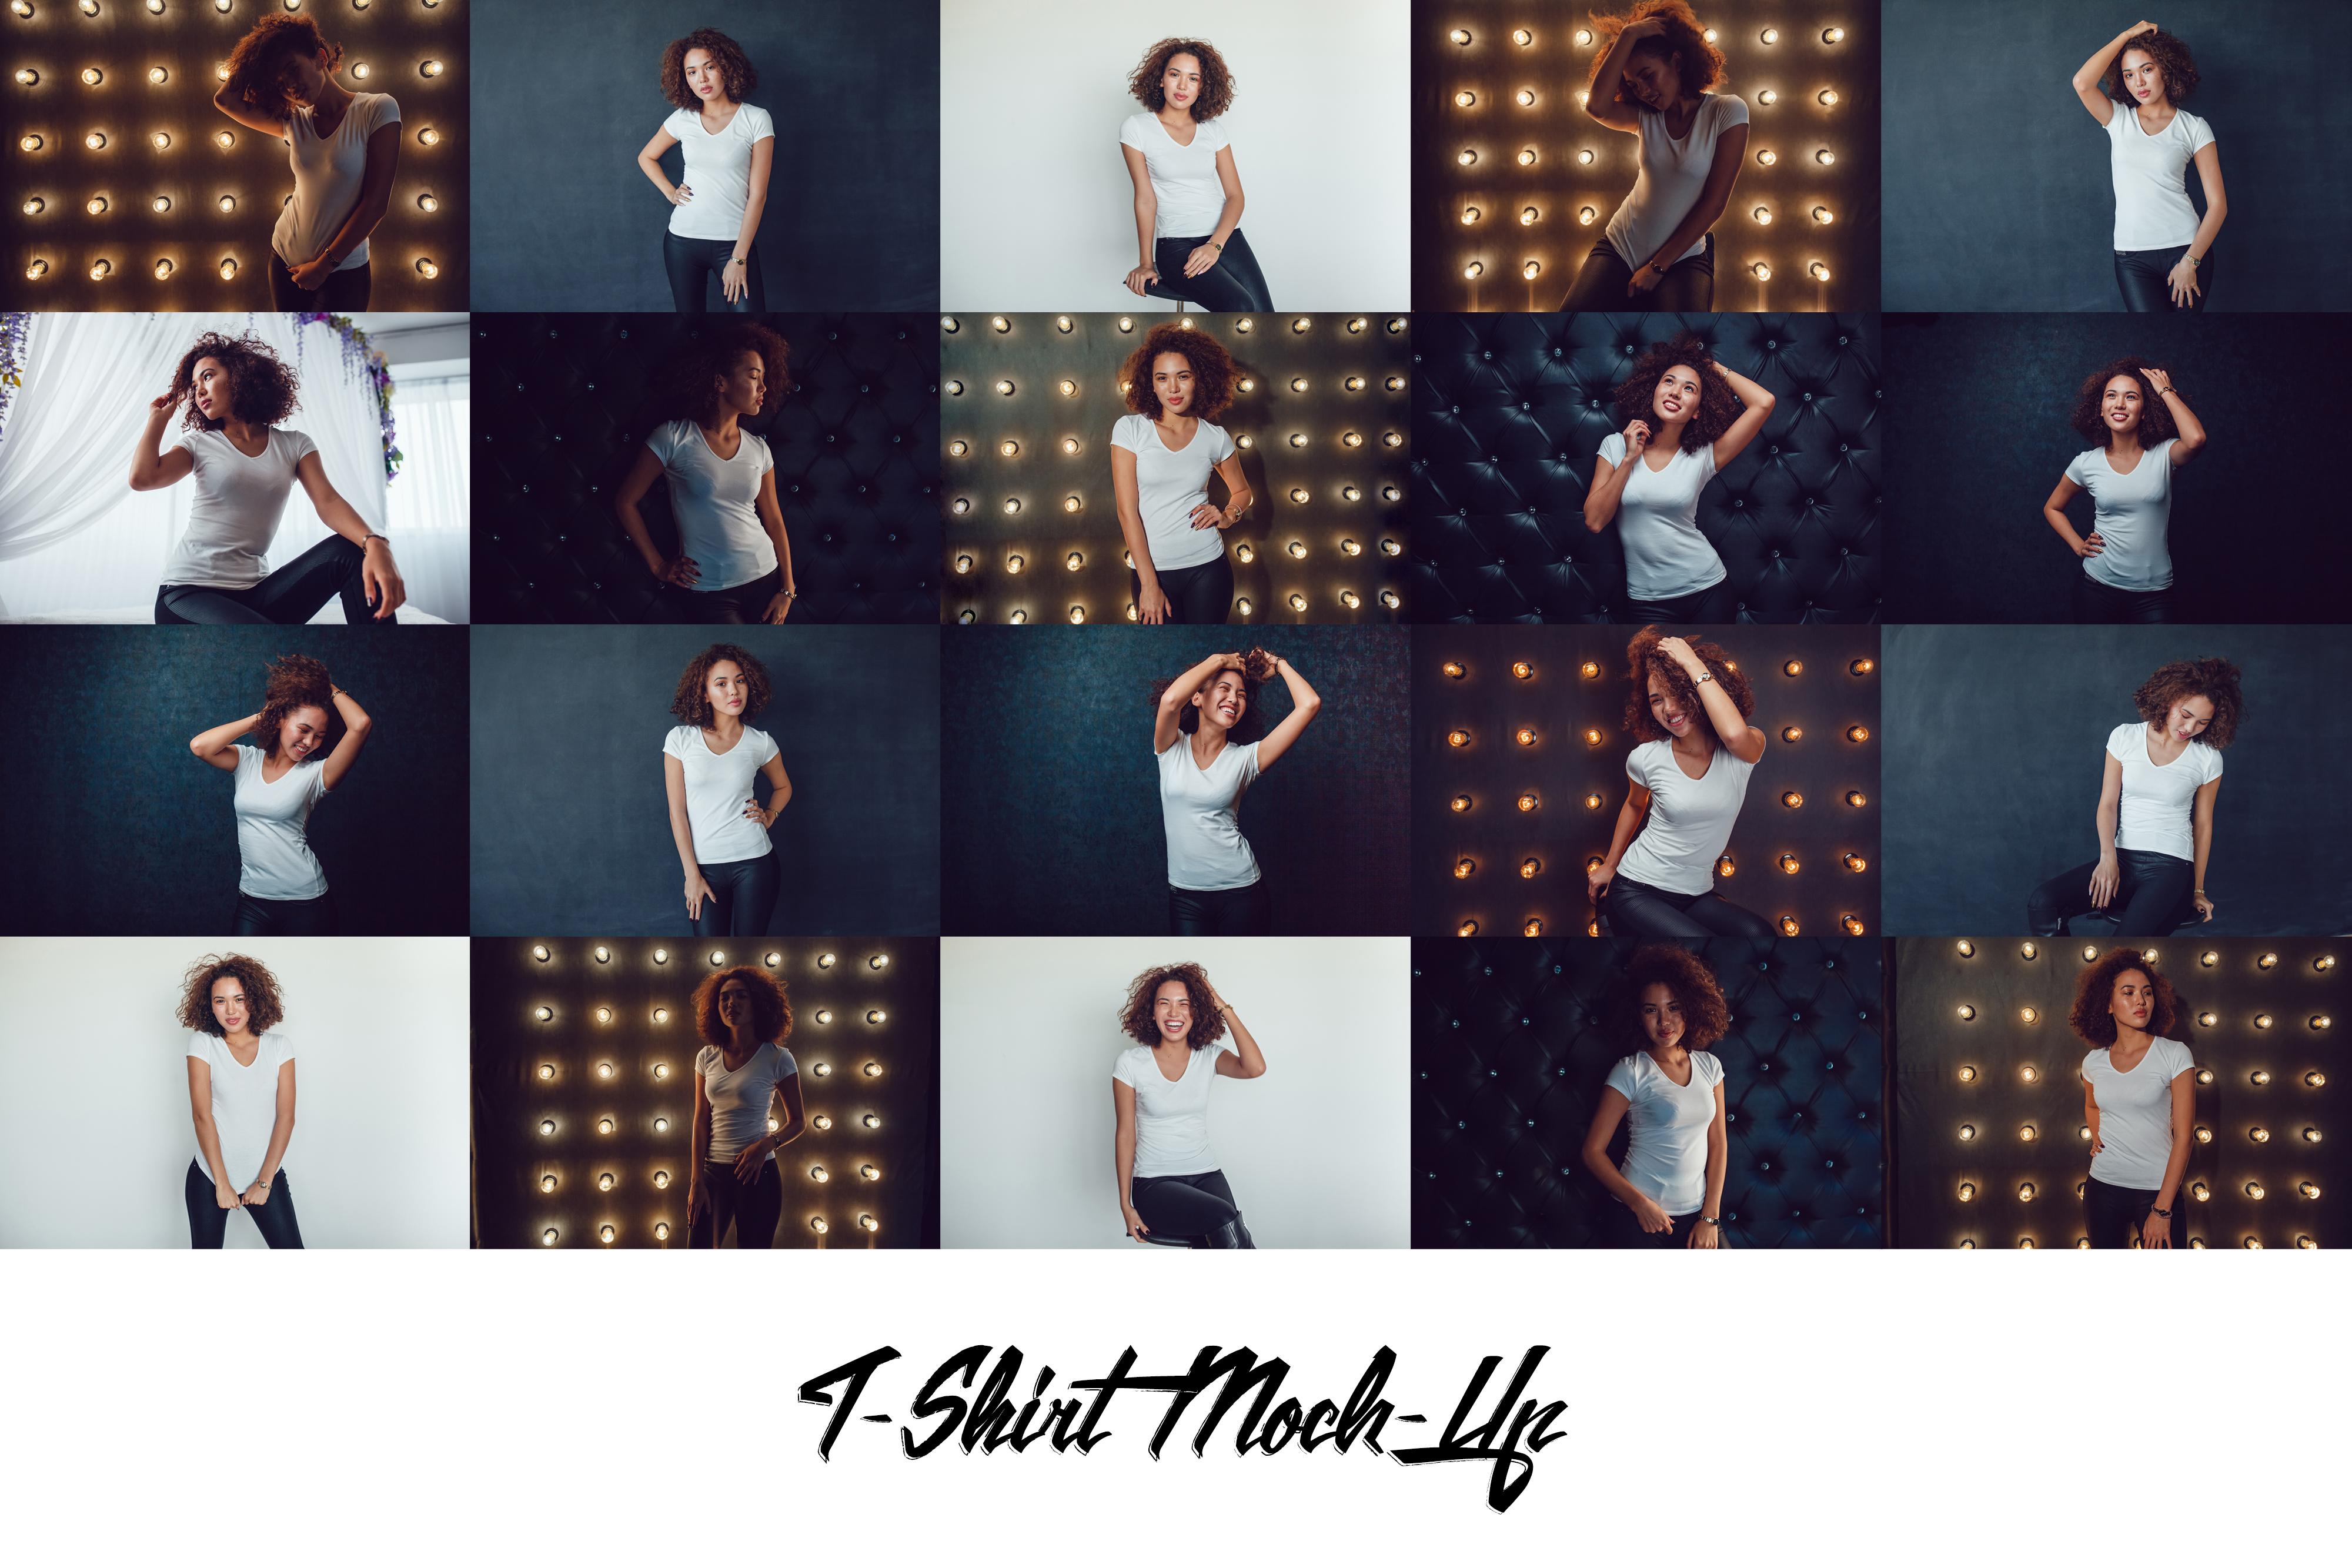 T-Shirt Mock-Up Vol.19 2017 example image 2